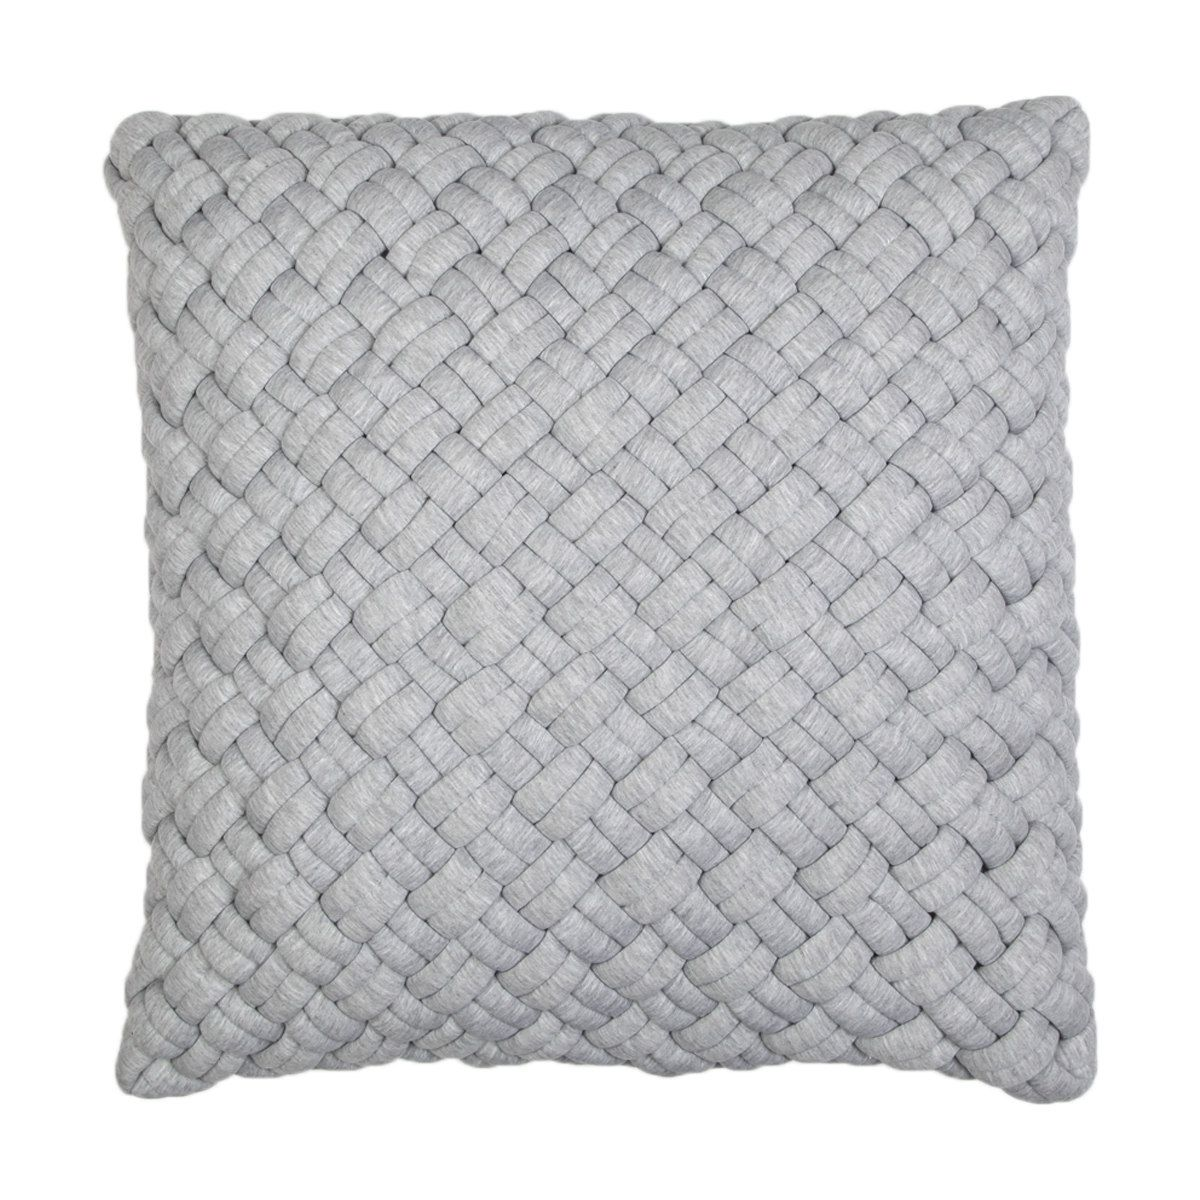 Flynn Cushion Grey Couch cushions, Cushions, Bed linen